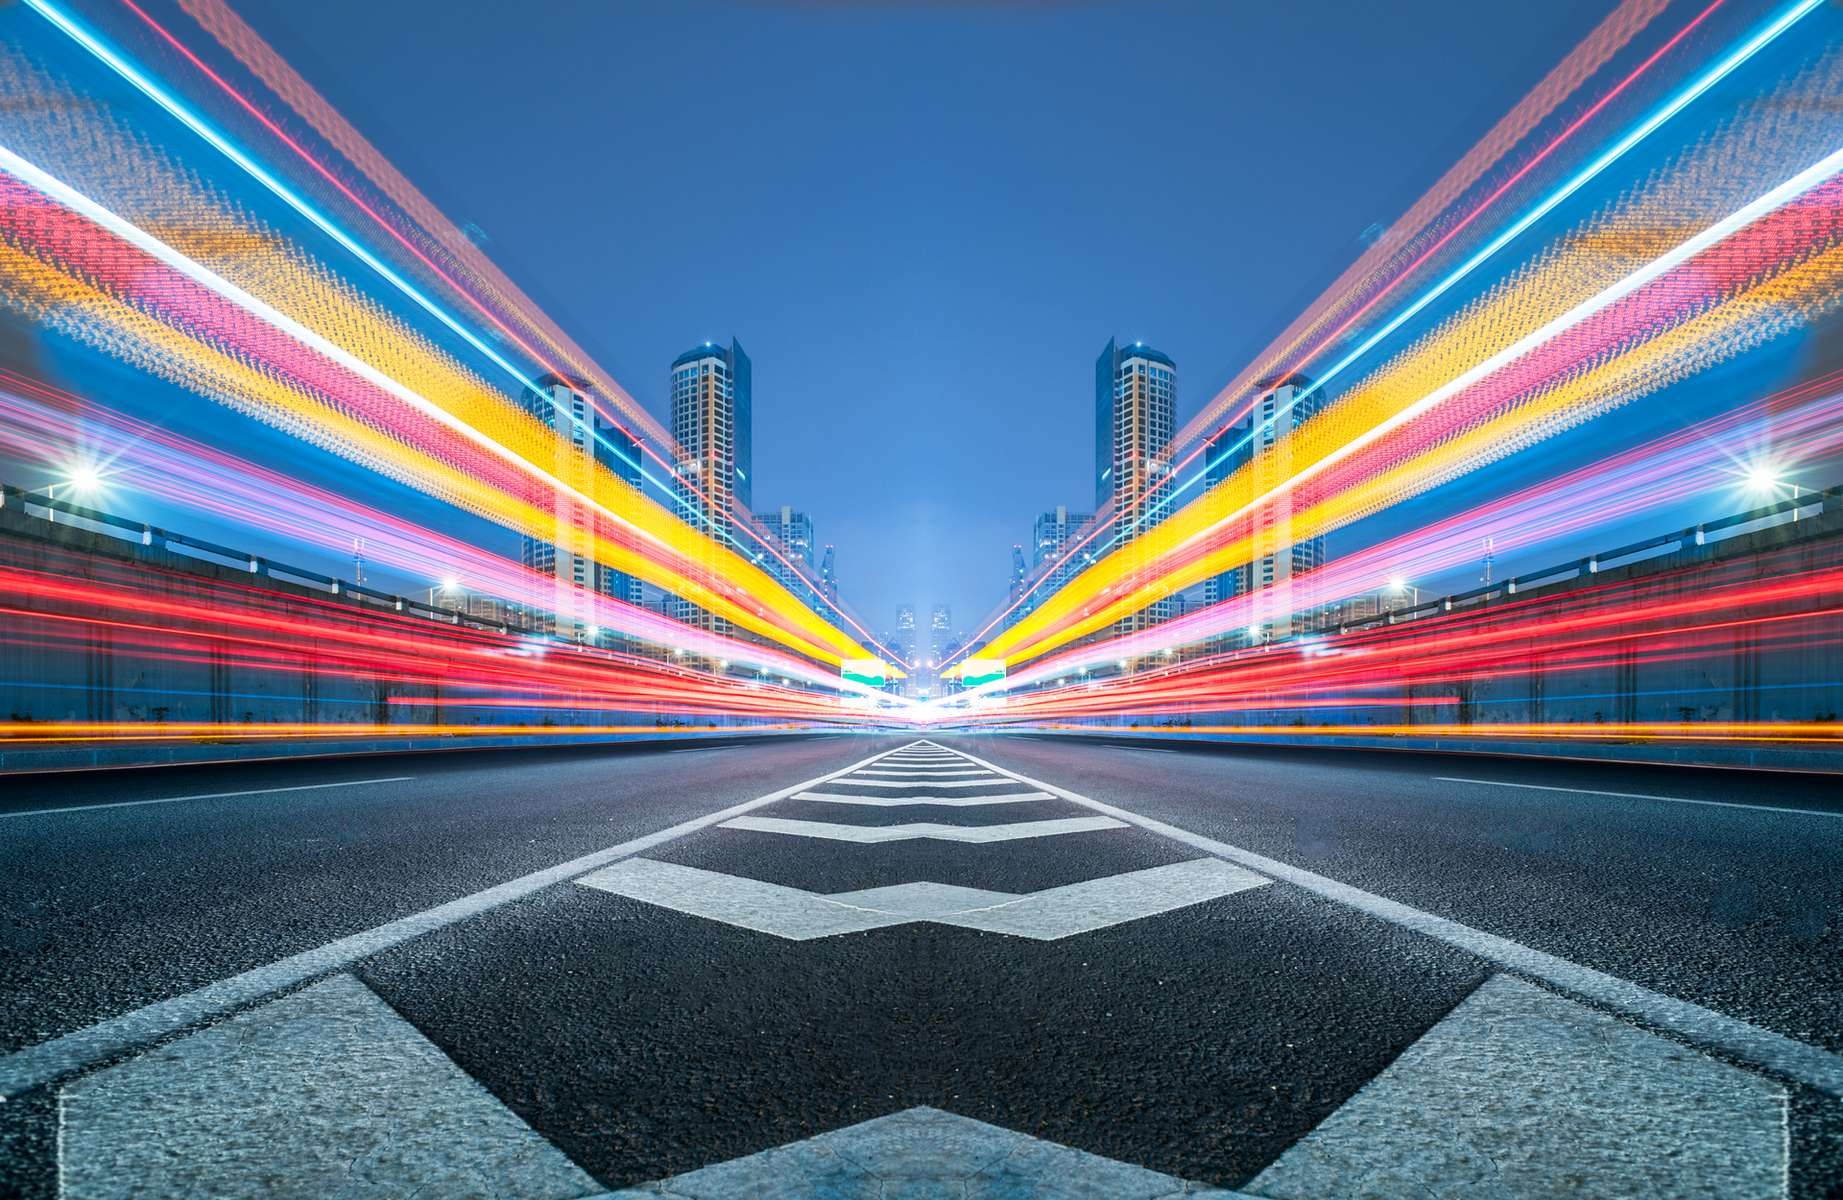 PIARC – WORKSHOP CONNECTED AND AUTONOMOUS VEHICLES AND ROADS: A PATH TOWARDS A SAFER FUTURE